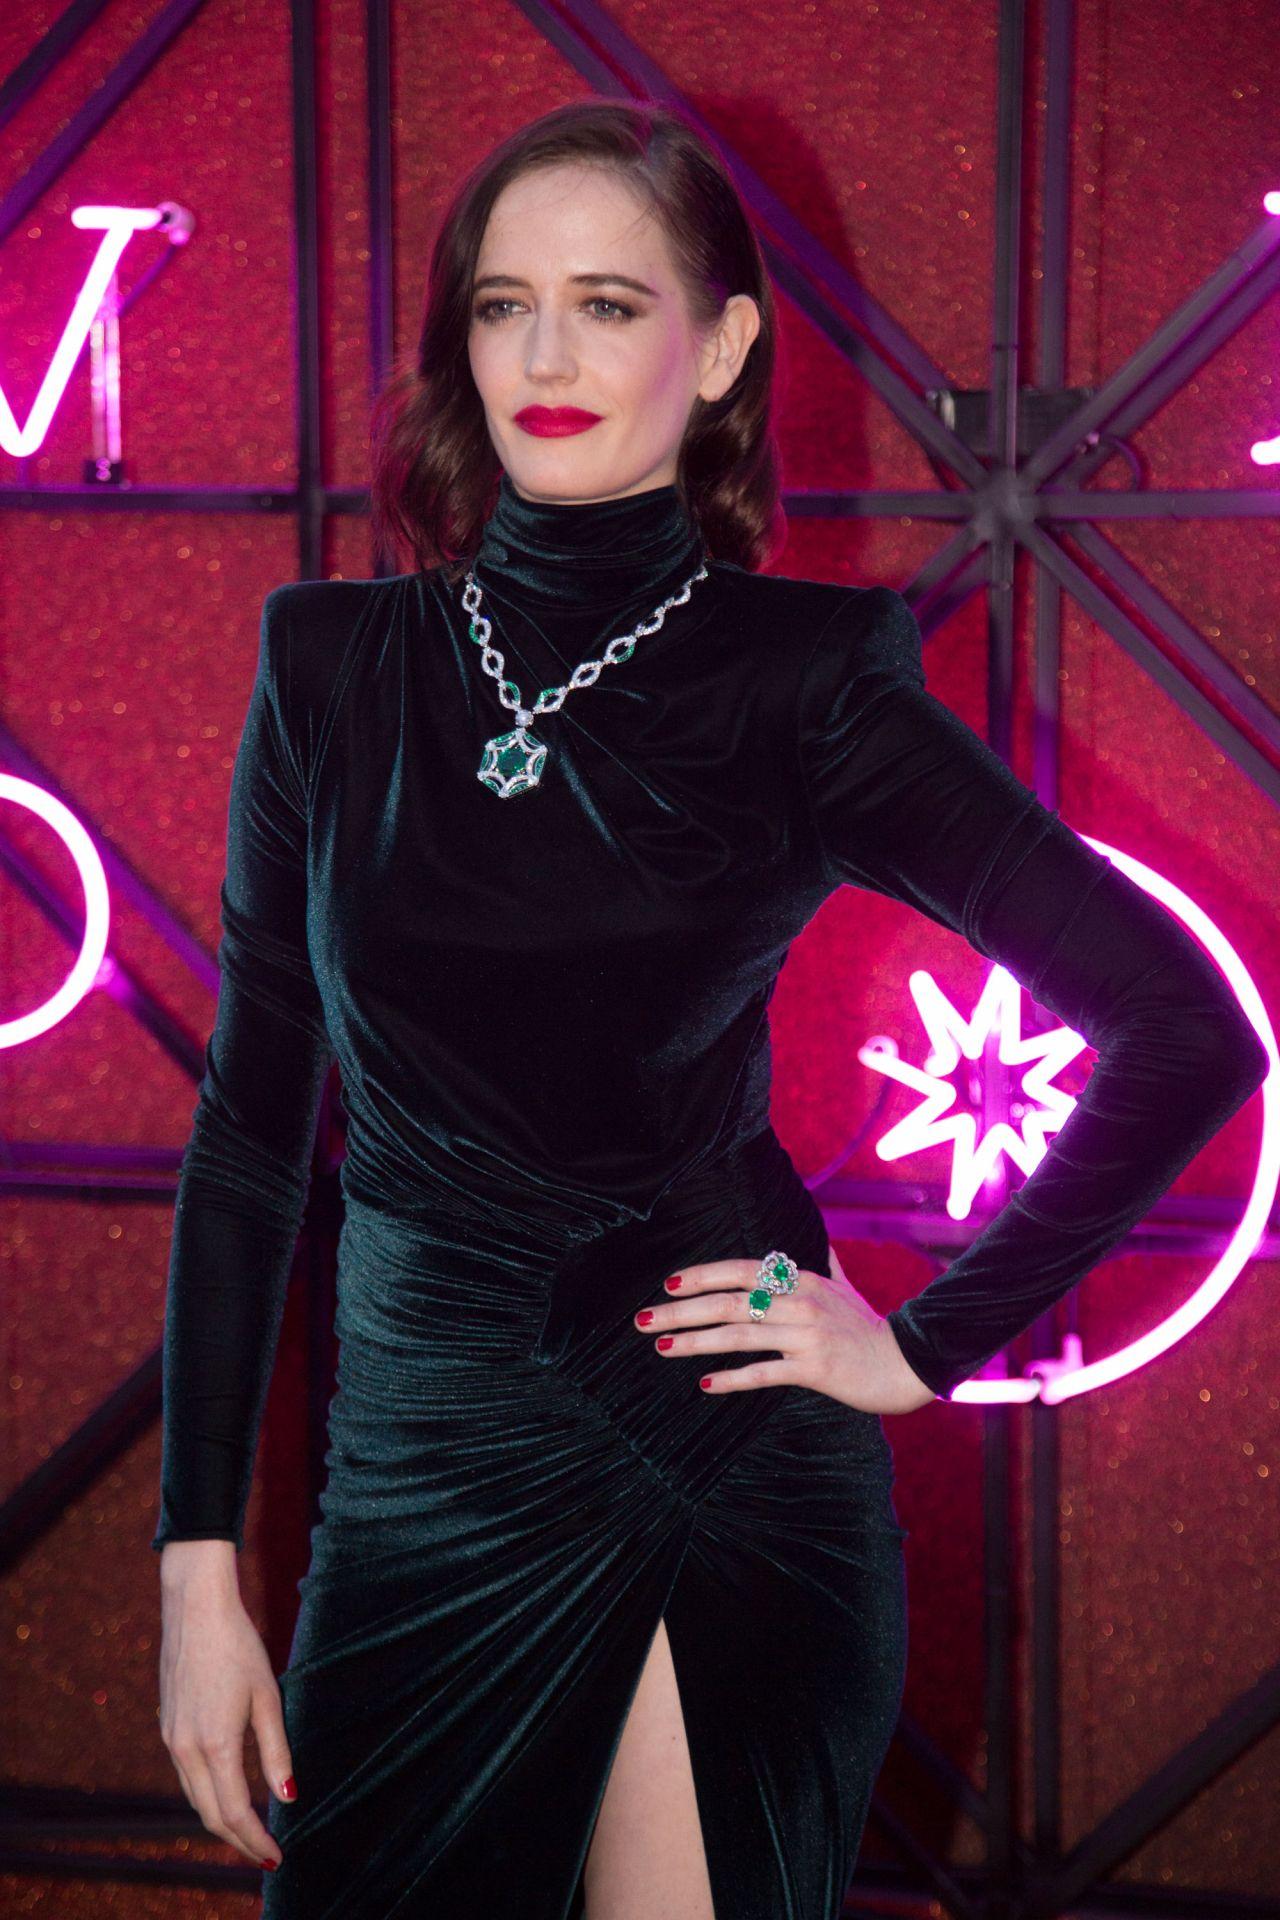 Eva Green - Bvlgari Gala Dinner in Rome 06/28/2018 Eva Green